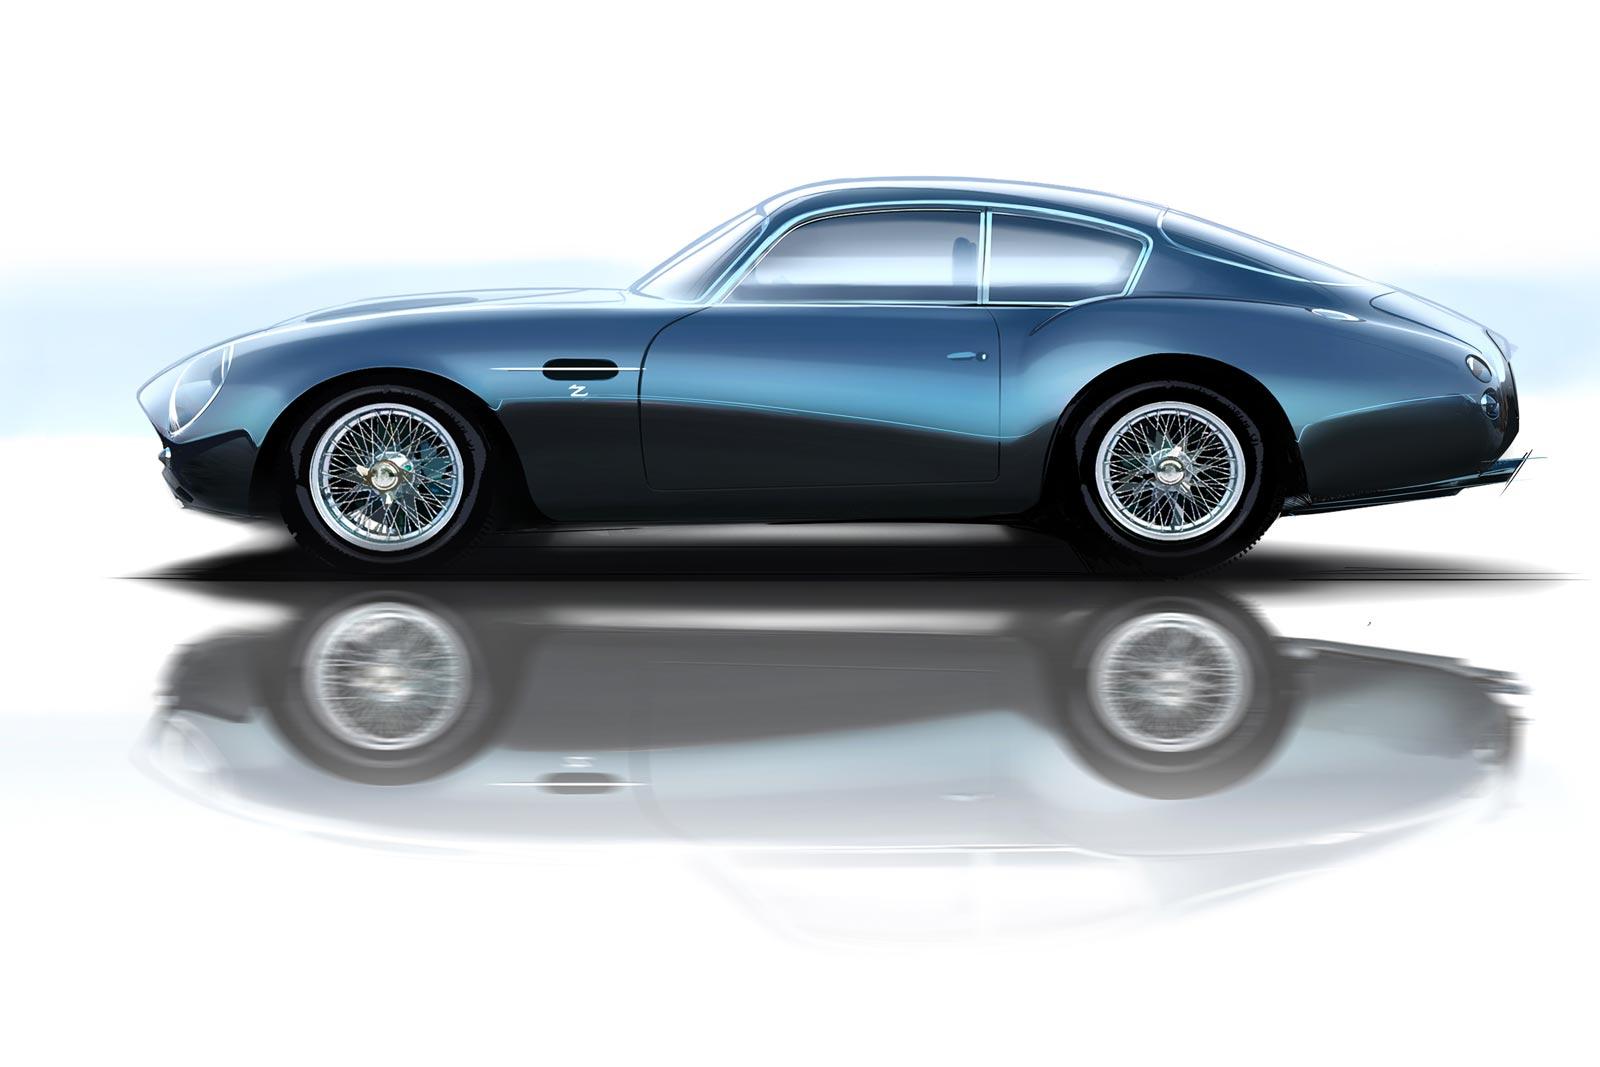 Aston Martin Db4 Gt Zagato Design Sketch Render Car Body Design